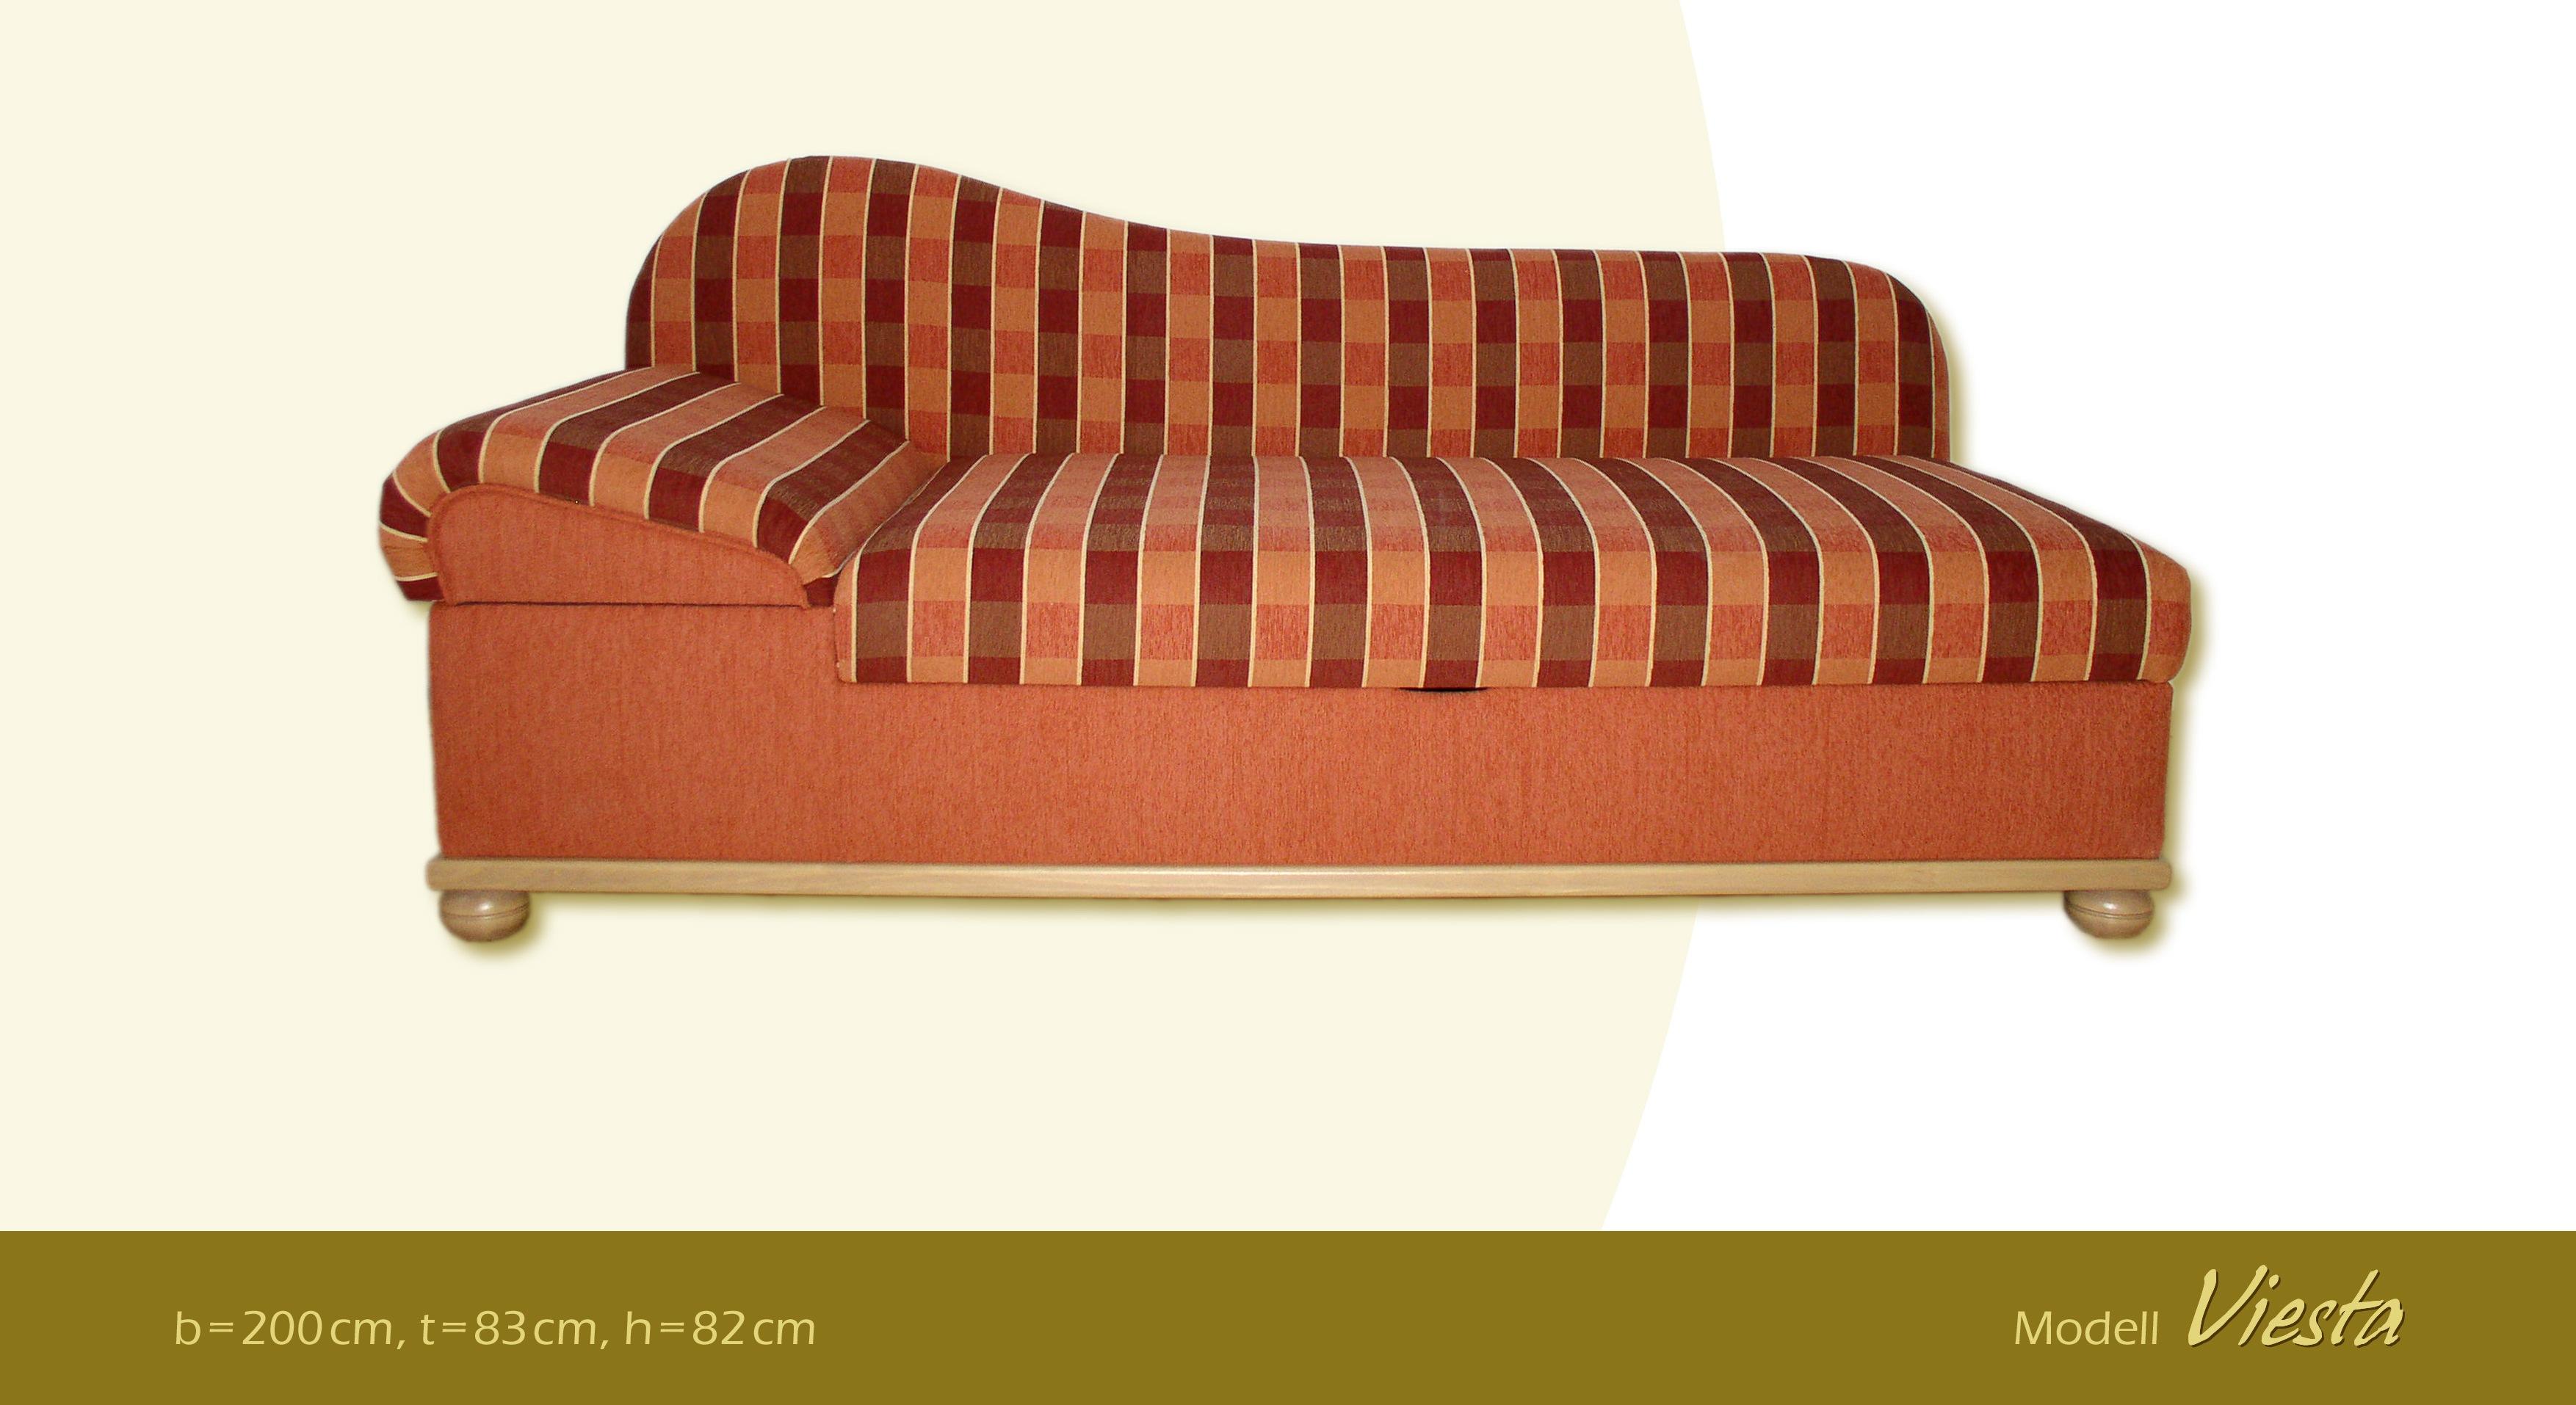 liege viesta m bel kurz. Black Bedroom Furniture Sets. Home Design Ideas